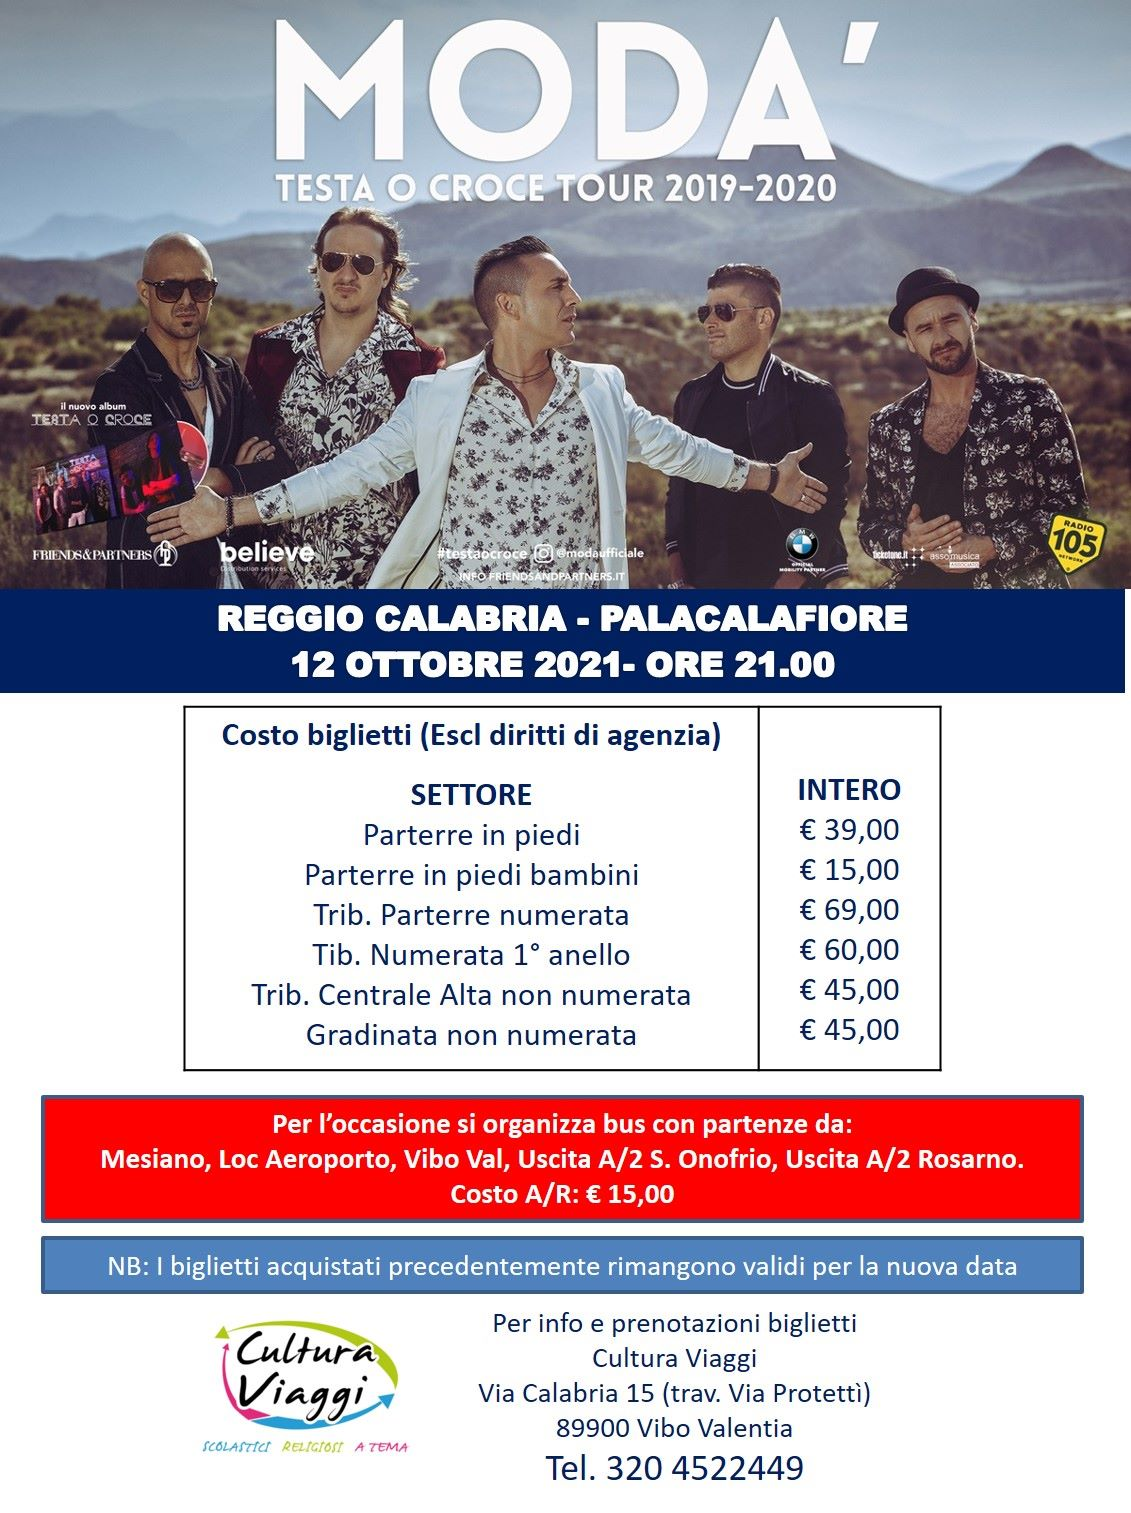 BUS - Concerto Modà - Reggio Calabria